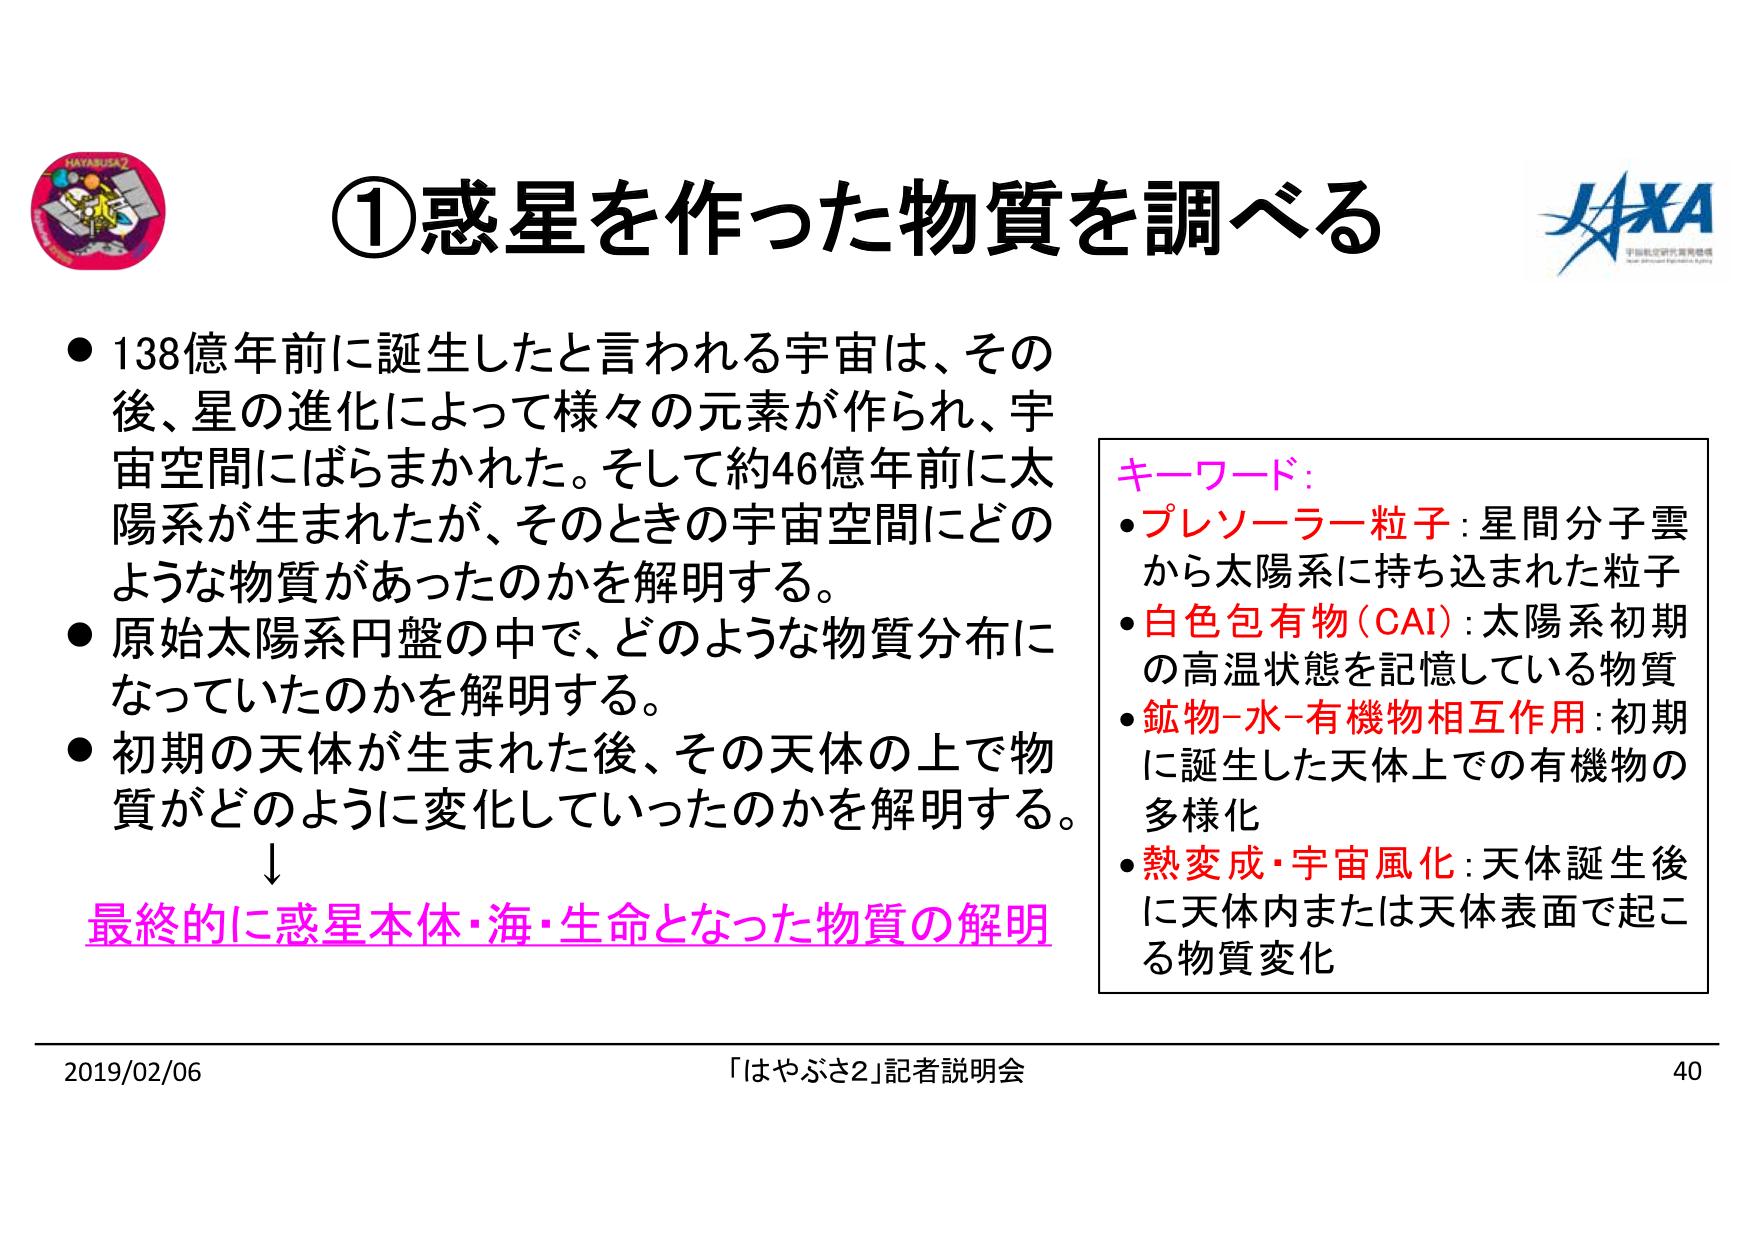 f:id:Imamura:20190204175534p:plain